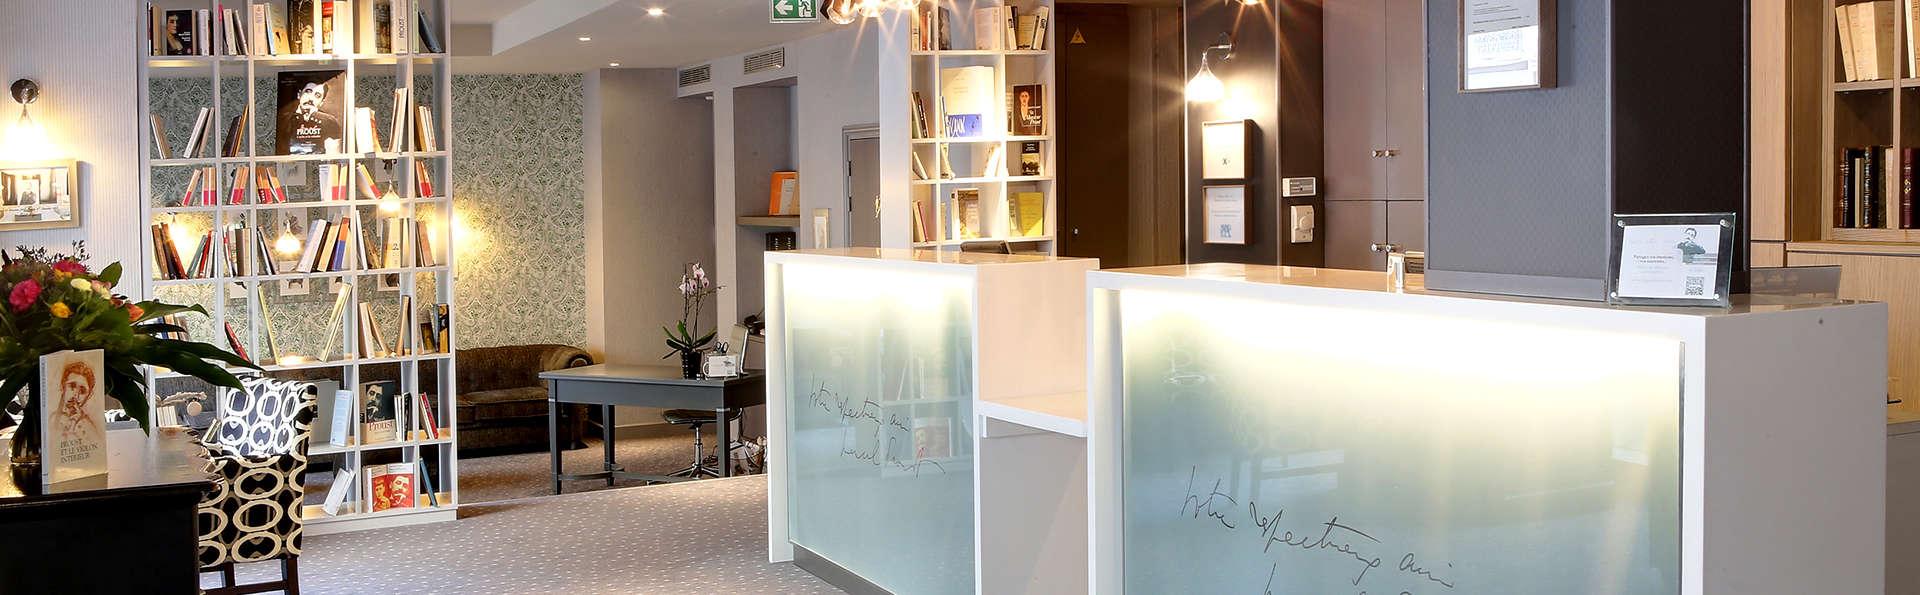 Best Western Premier Hôtel Littéraire Le Swann - Edit_Reception.jpg